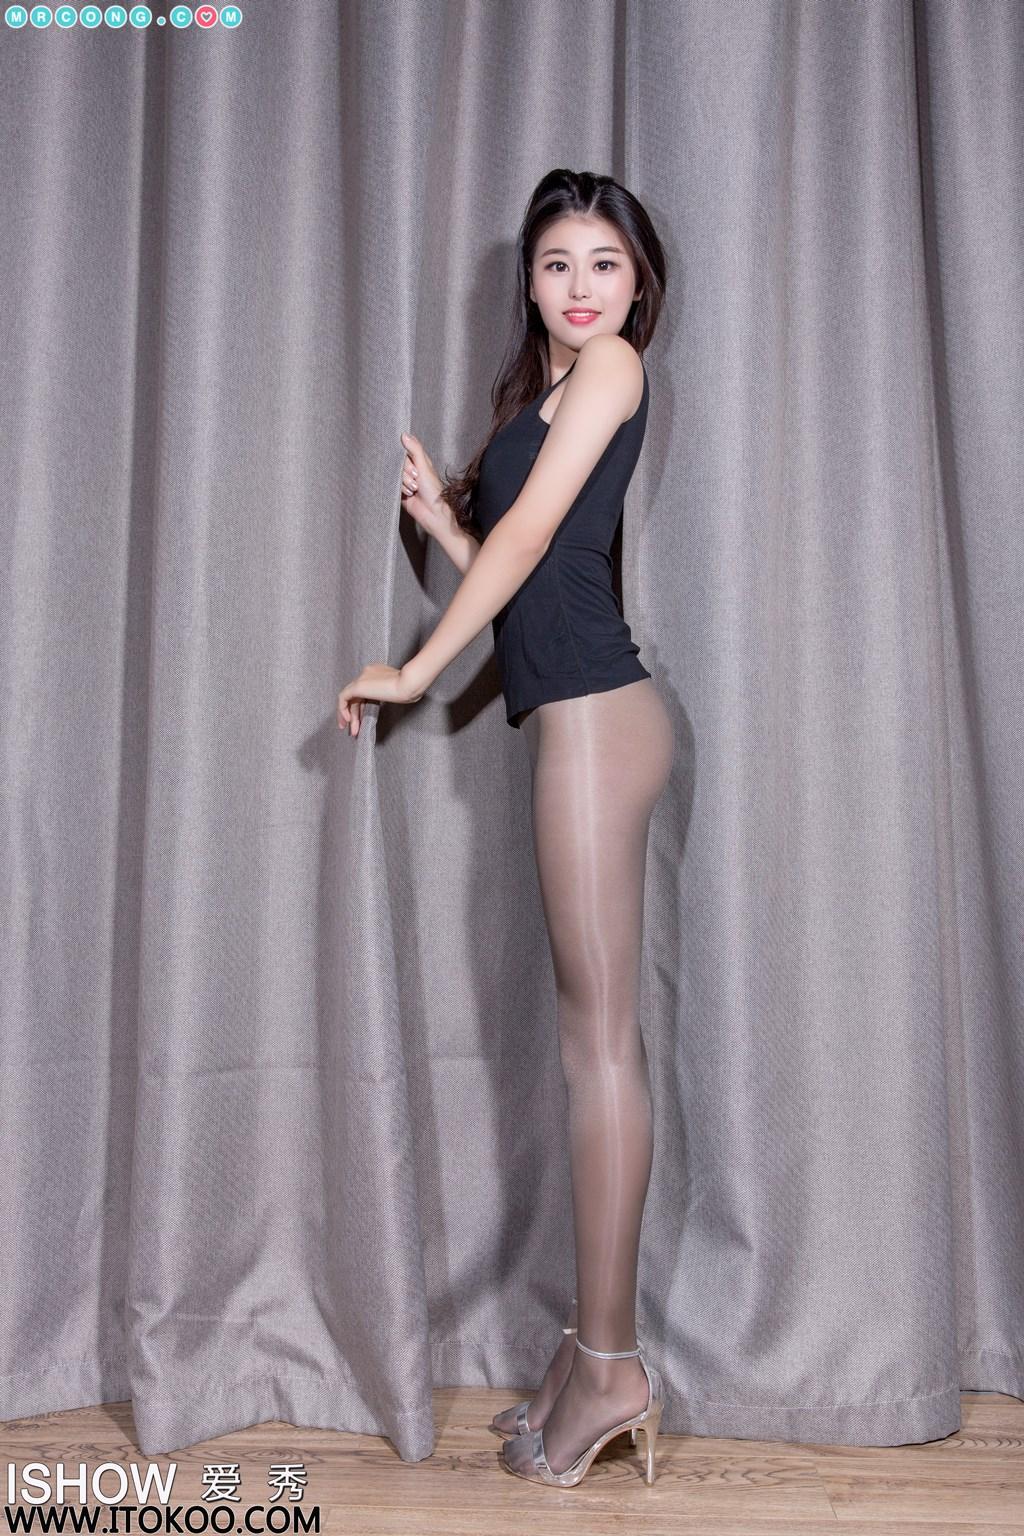 Image ISHOW-No.160-Liu-Yue-Fei-Phoebe-MrCong.com-007 in post ISHOW No.160: Người mẫu Liu Yue Fei (刘玥菲Phoebe) (31 ảnh)